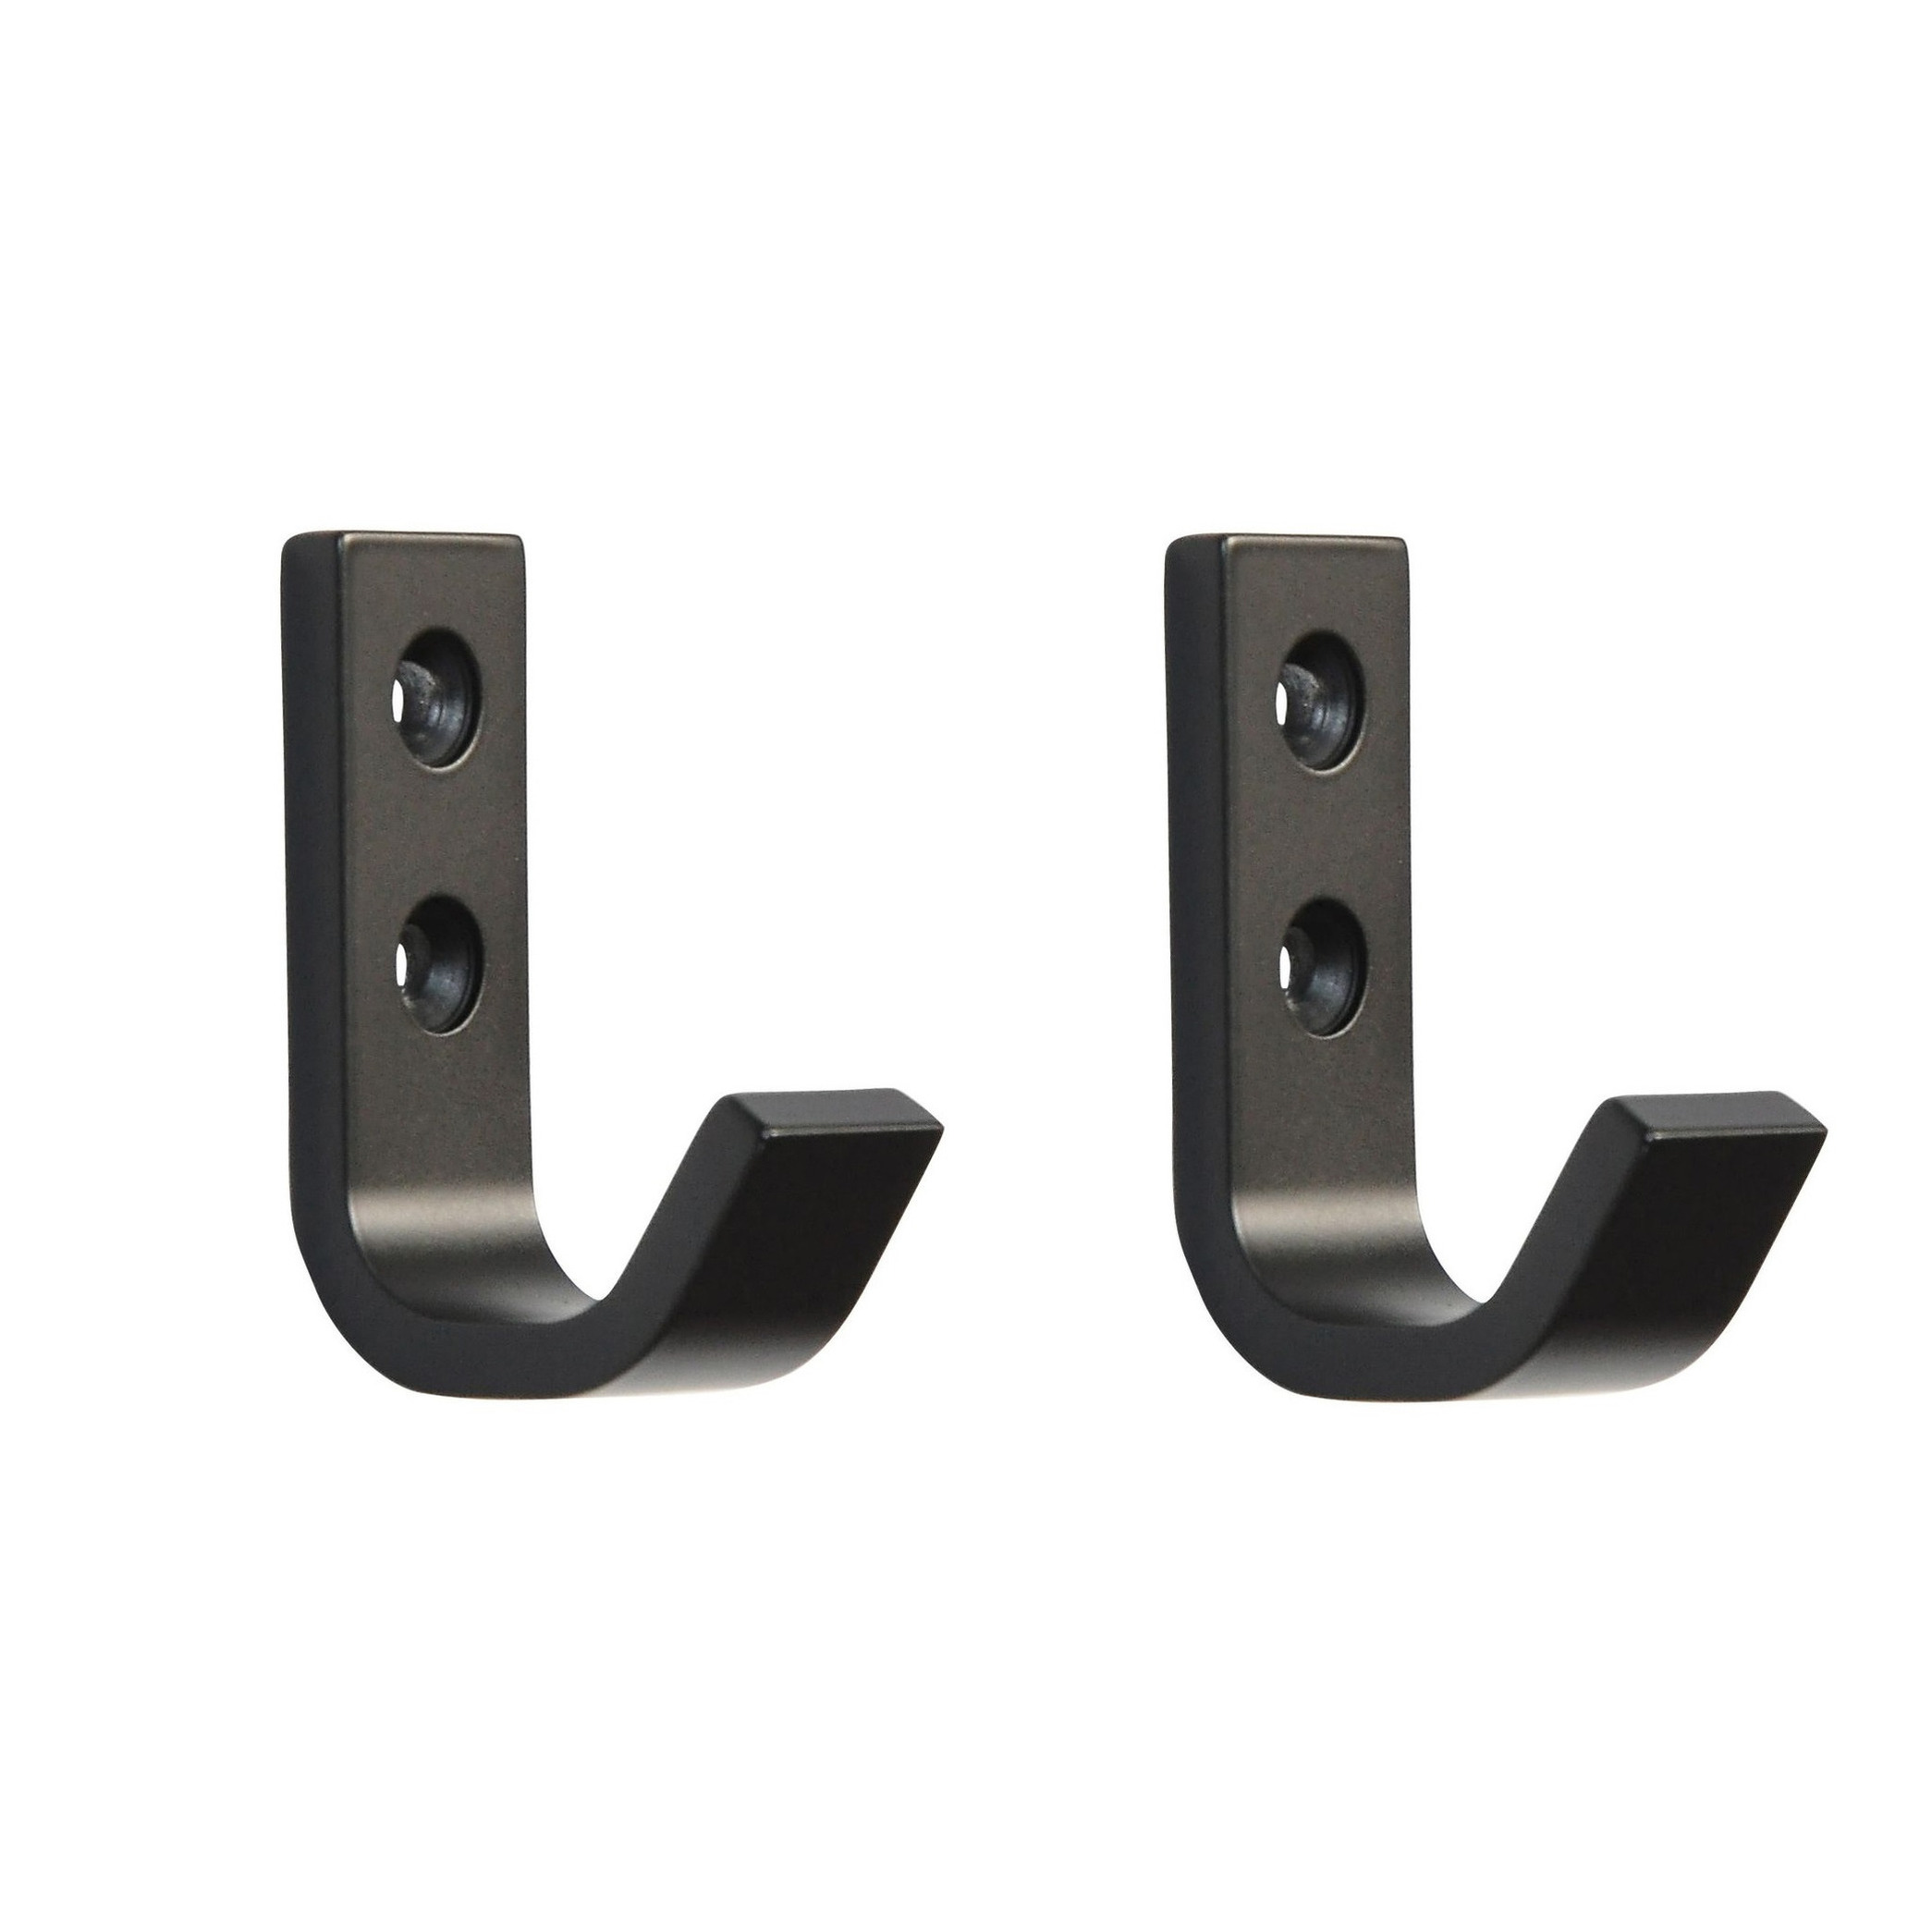 2x Luxe zwarte garderobe haakjes-jashaken-kapstokhaakjes hoogwaardig aluminium 5,4 x 3,7 cm